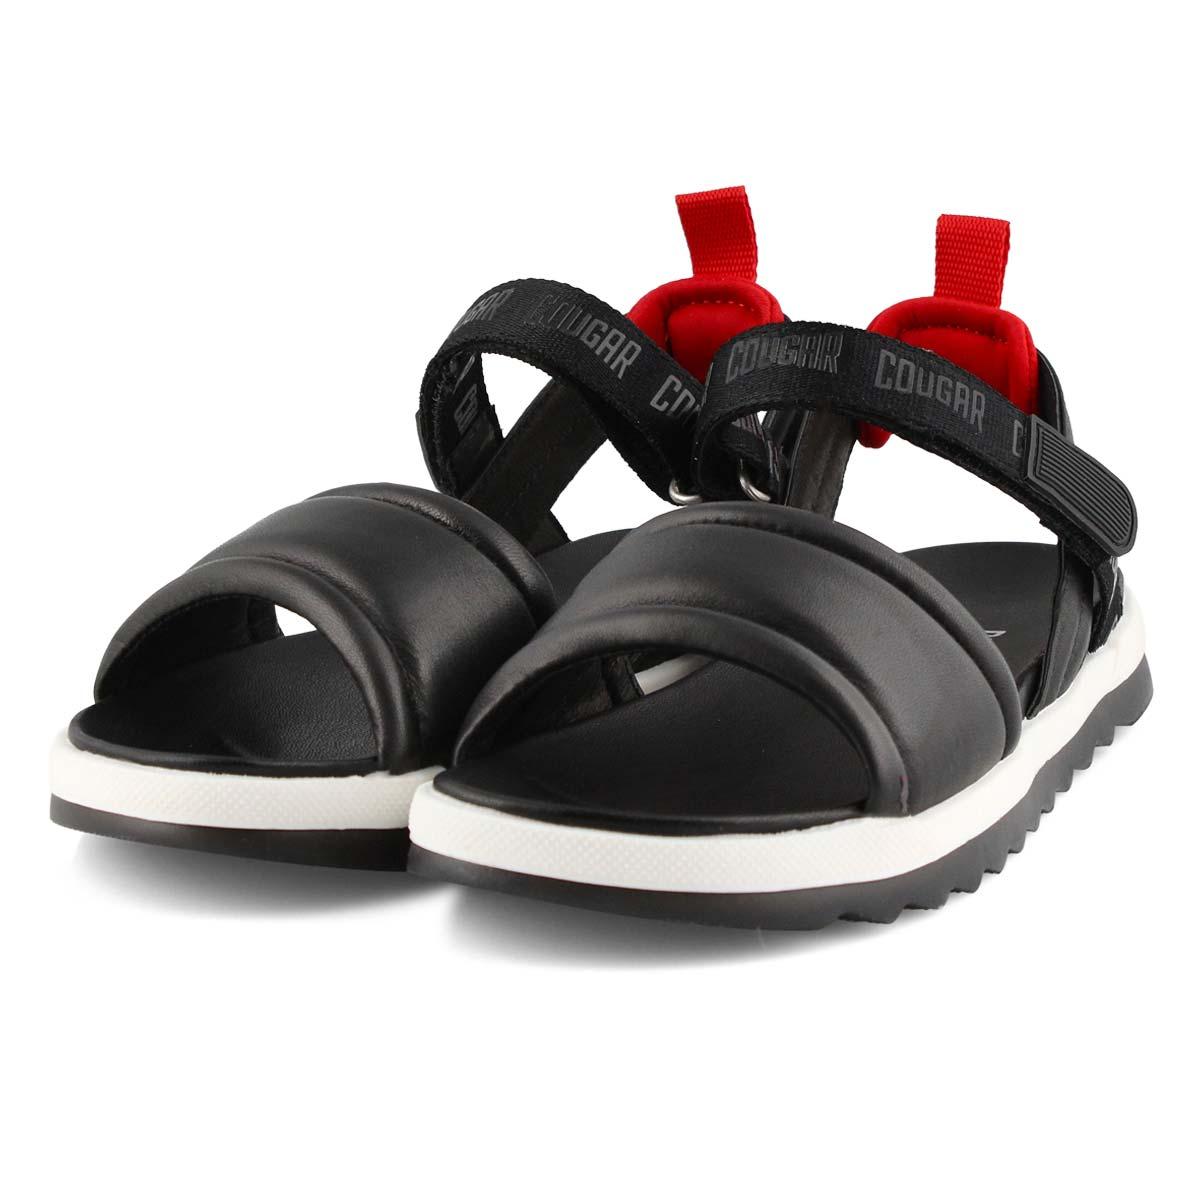 Women's LEONA black sport sandals